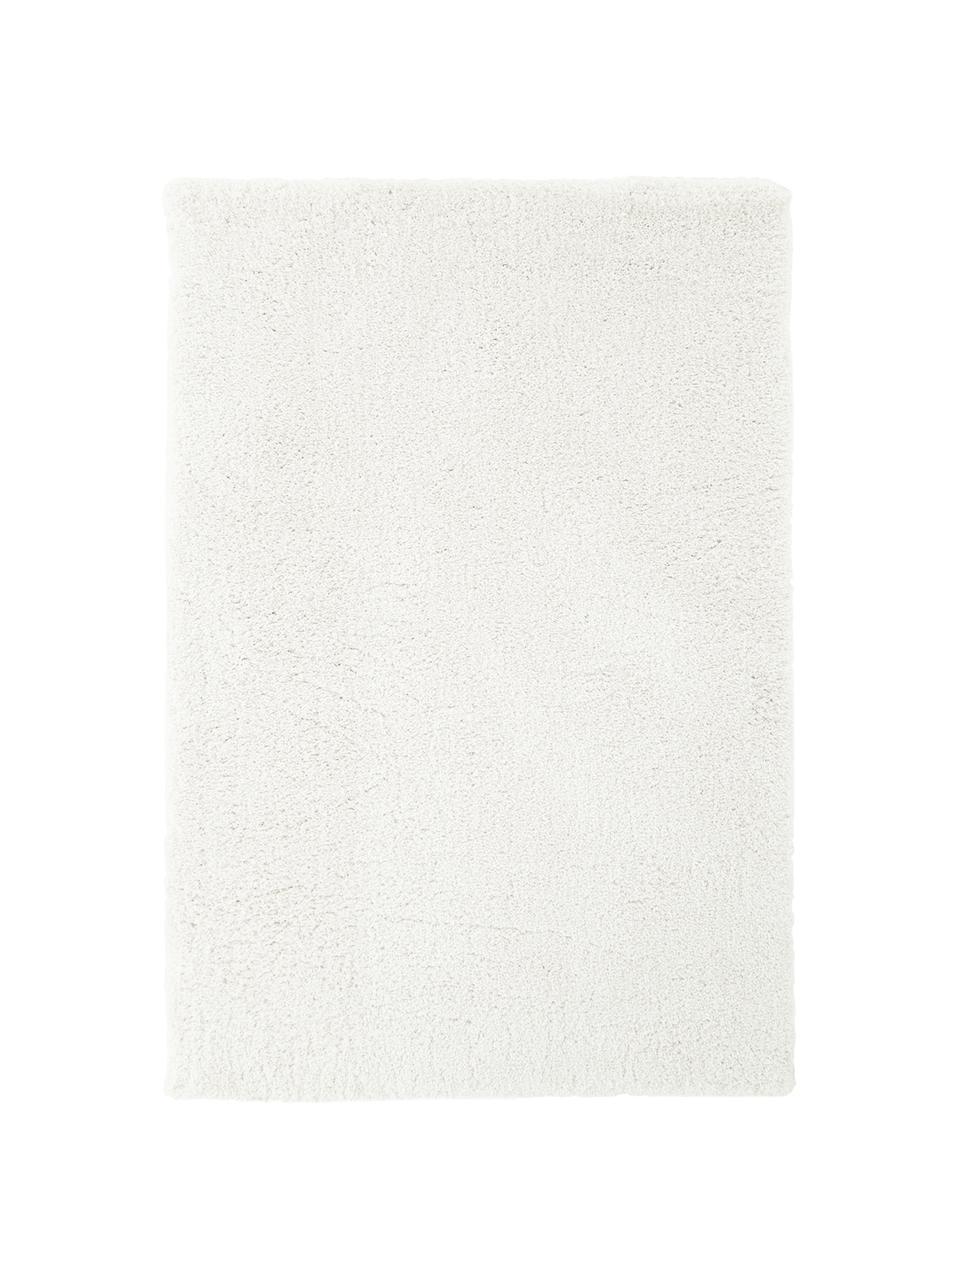 Tappeto morbido a pelo lungo color crema Leighton, Retro: 70% poliestere, 30% coton, Crema, Larg. 80 x Lung. 150 cm (taglia XS)